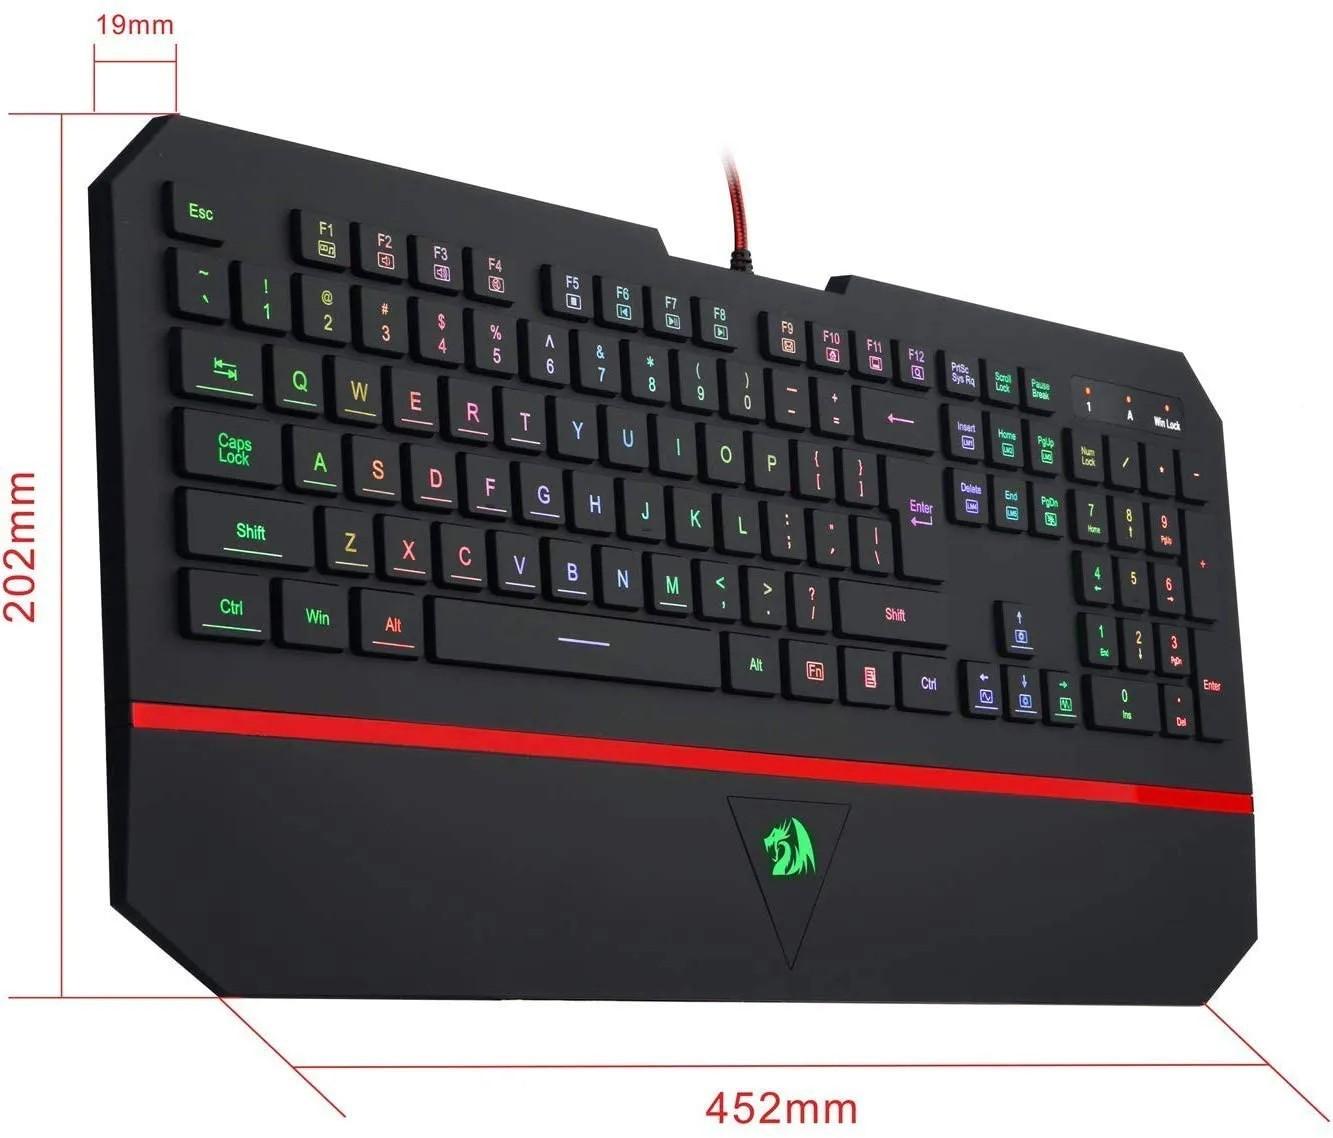 Teclado Gamer Redragon Karura 2 K502rgb Abnt2 Multimídia